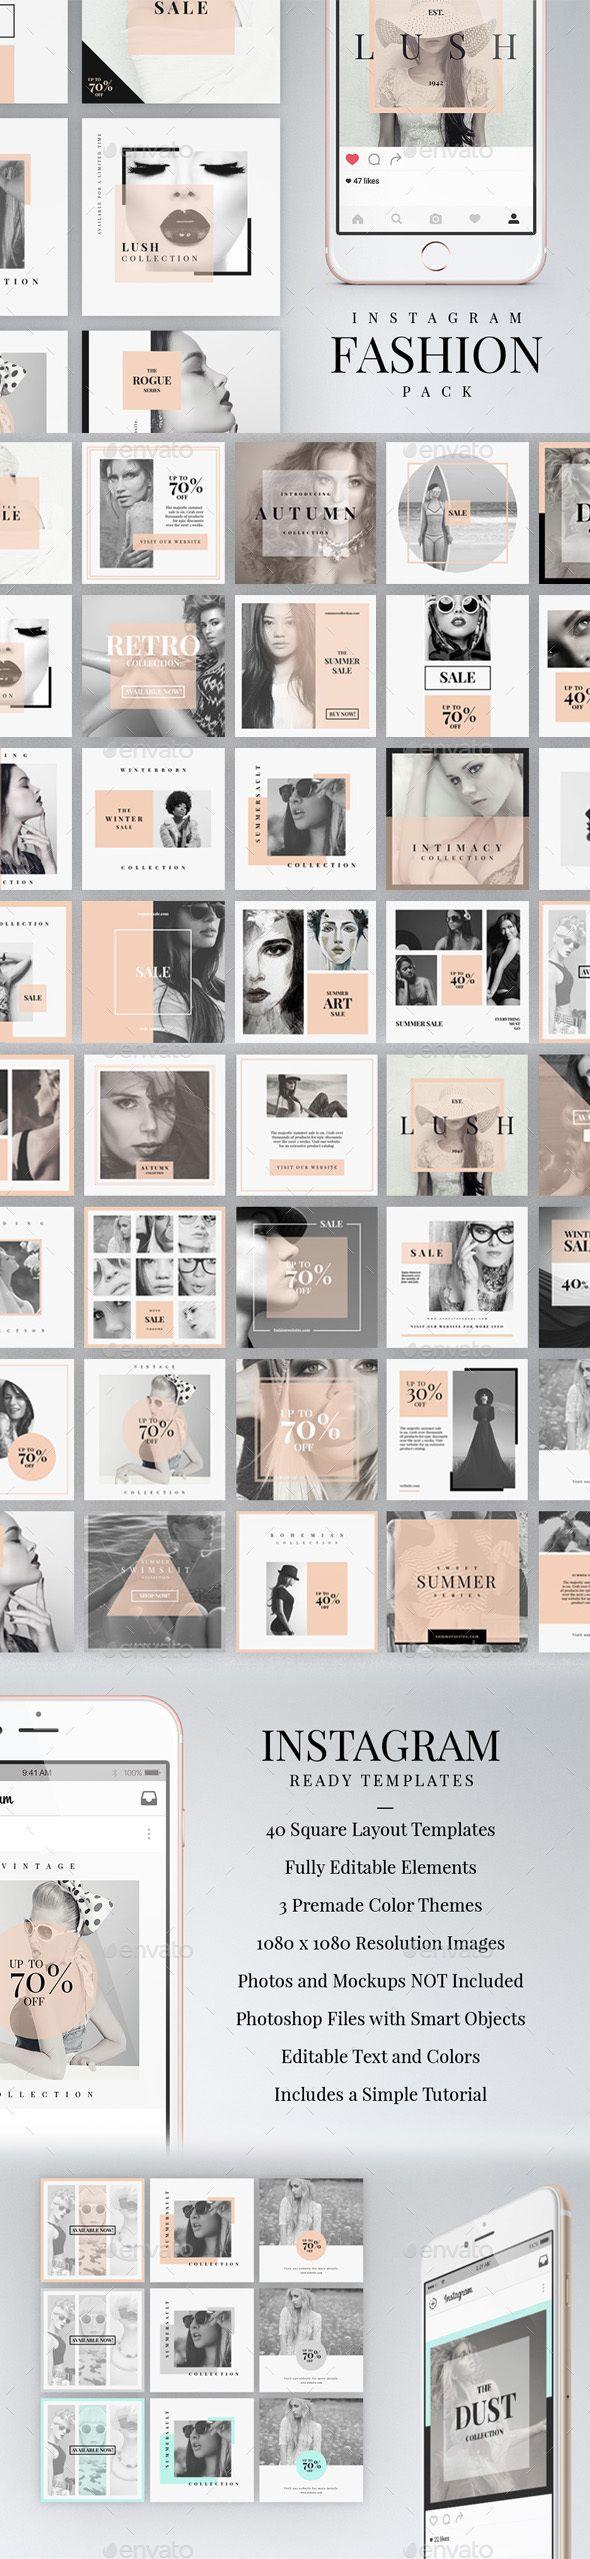 Instagram Fashion Pack Psd Template Etsy Social Media